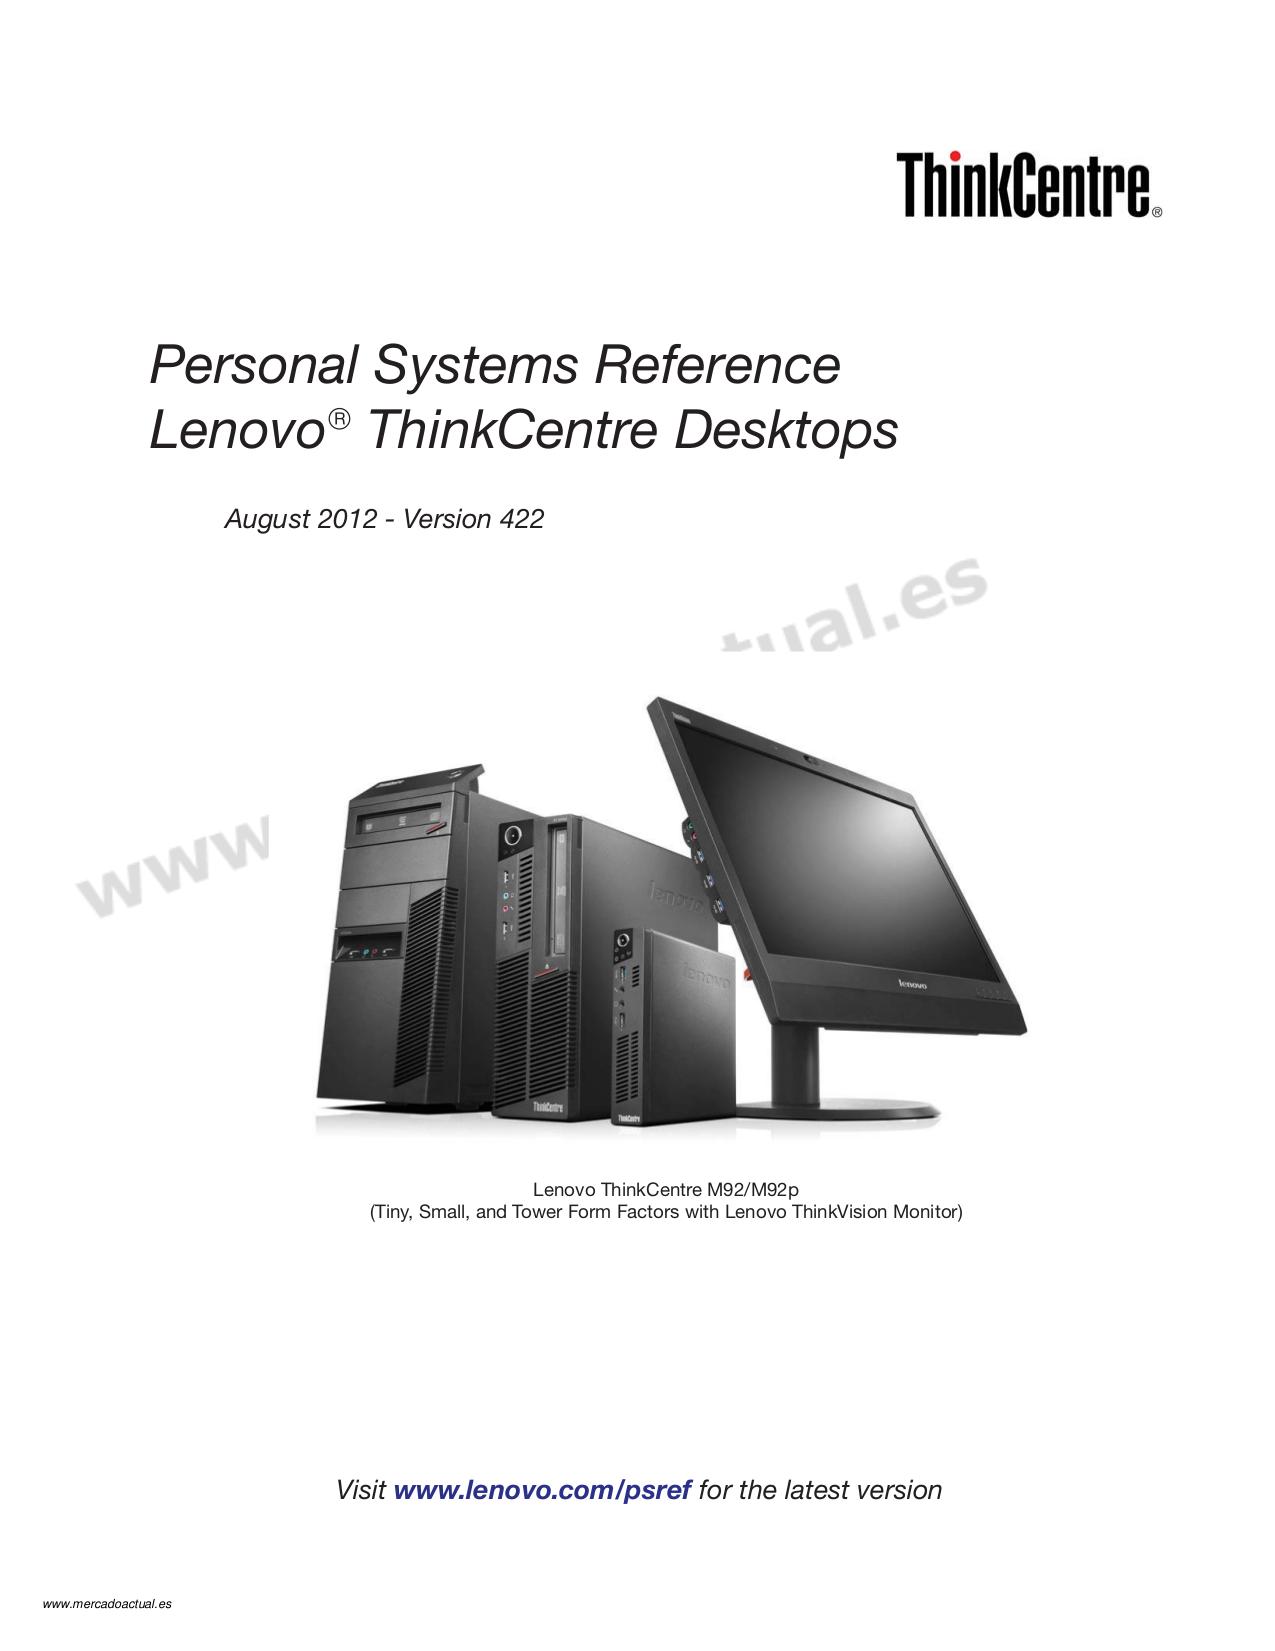 pdf for Lenovo Desktop ThinkCentre M71e 3176 SFF manual